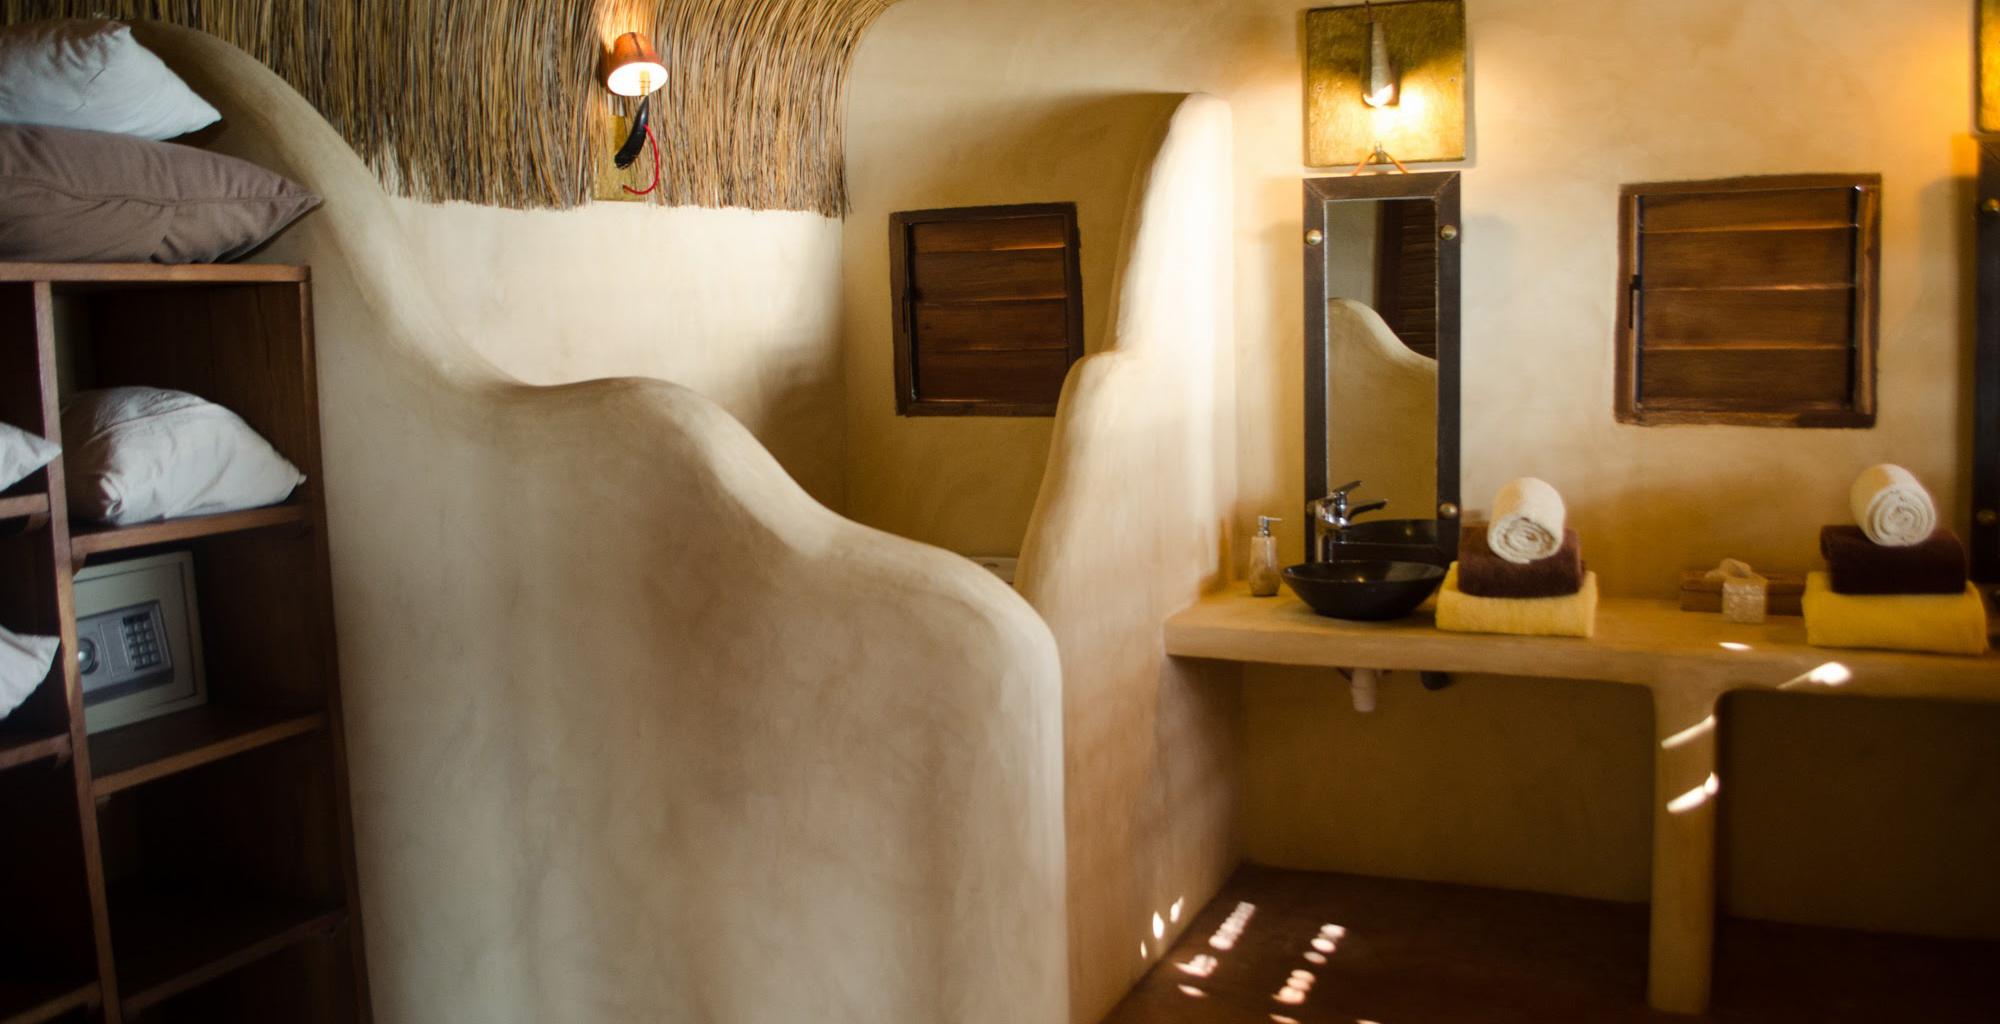 Madagascar-Five-Senses-Bathroom